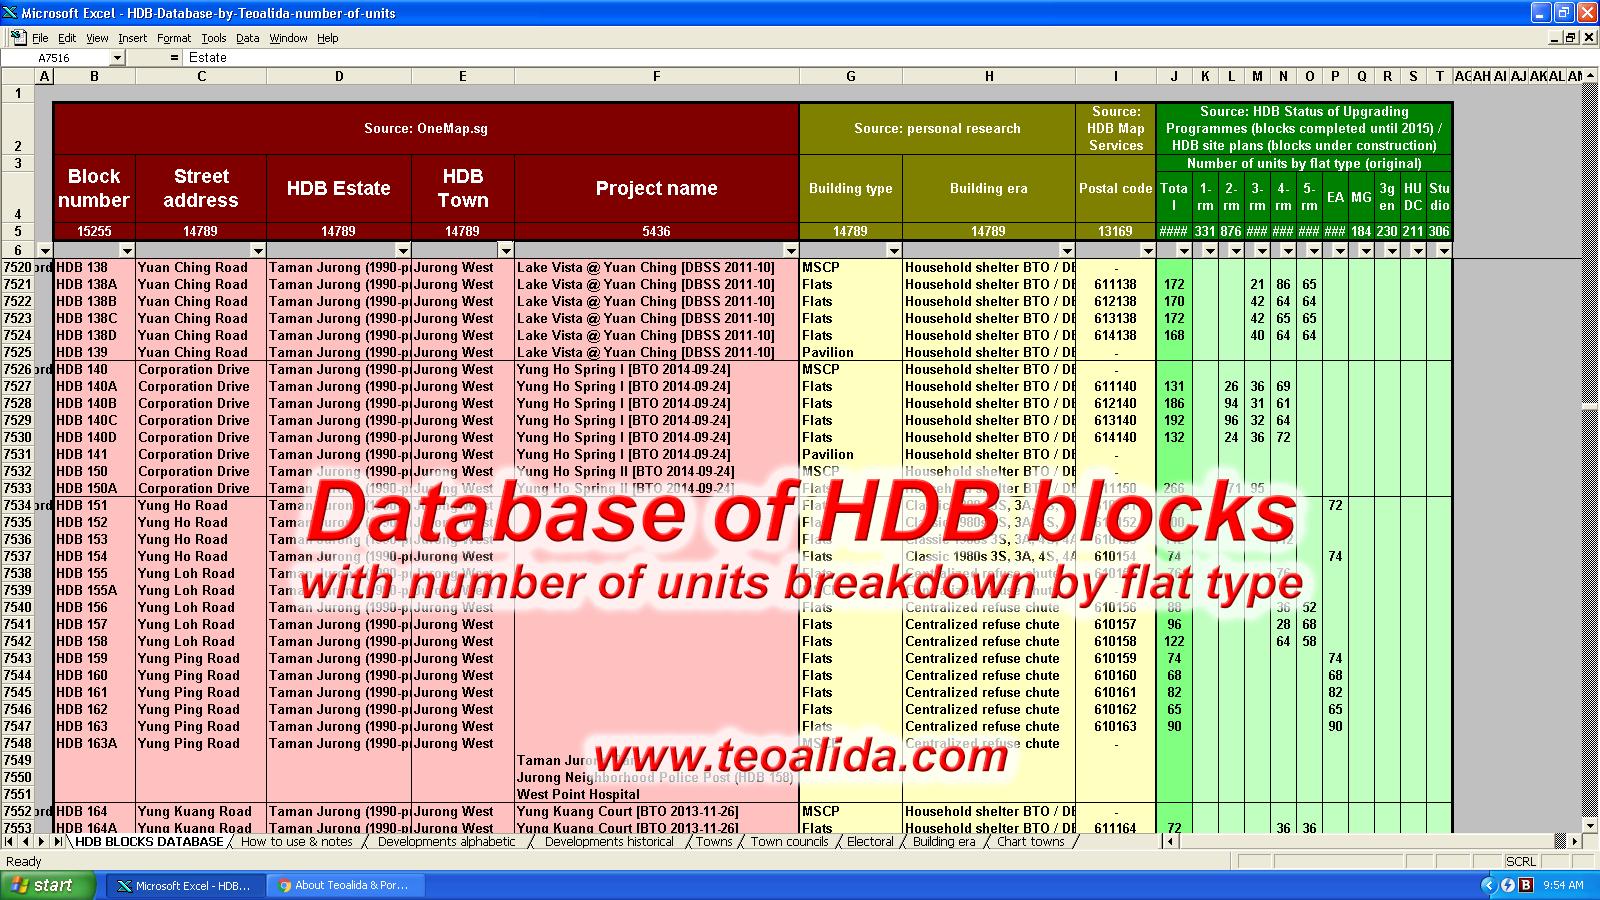 HDB Database, block number, street address, postal code, number of units breakdown by flat type